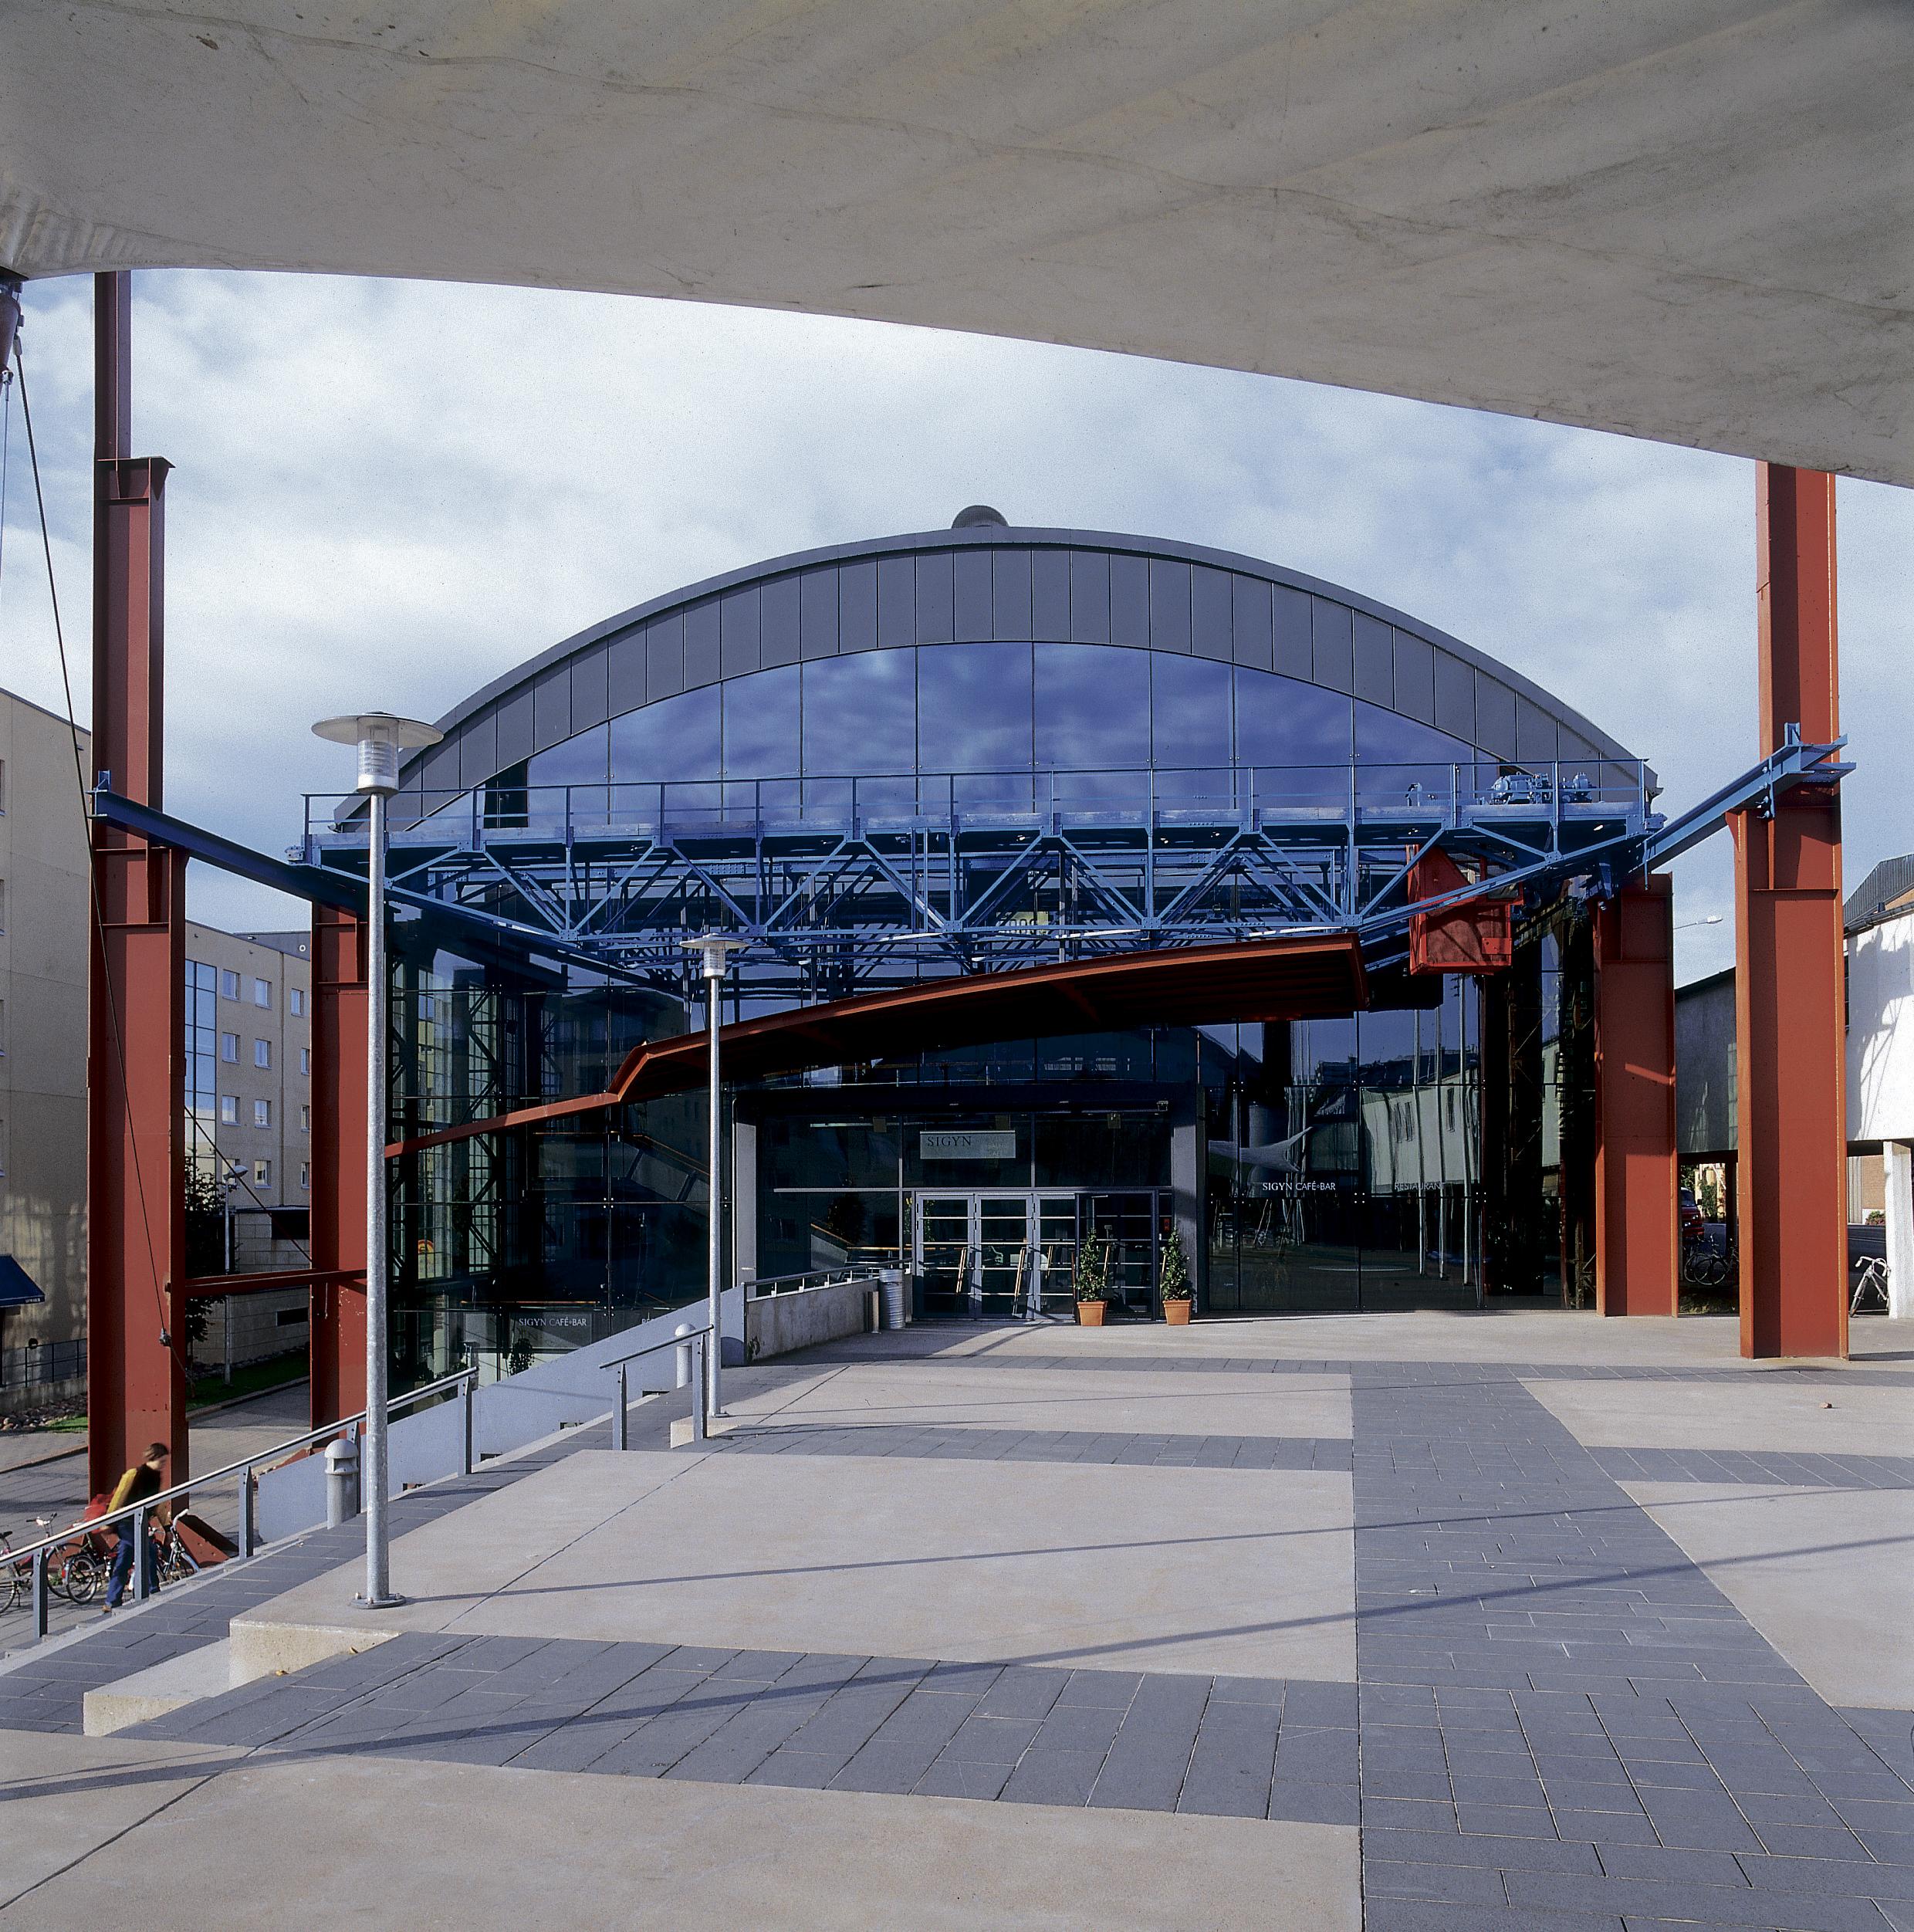 Sigyn Hall of the Turku Music Conservatory. Photo: Courtesy of Visit Turku